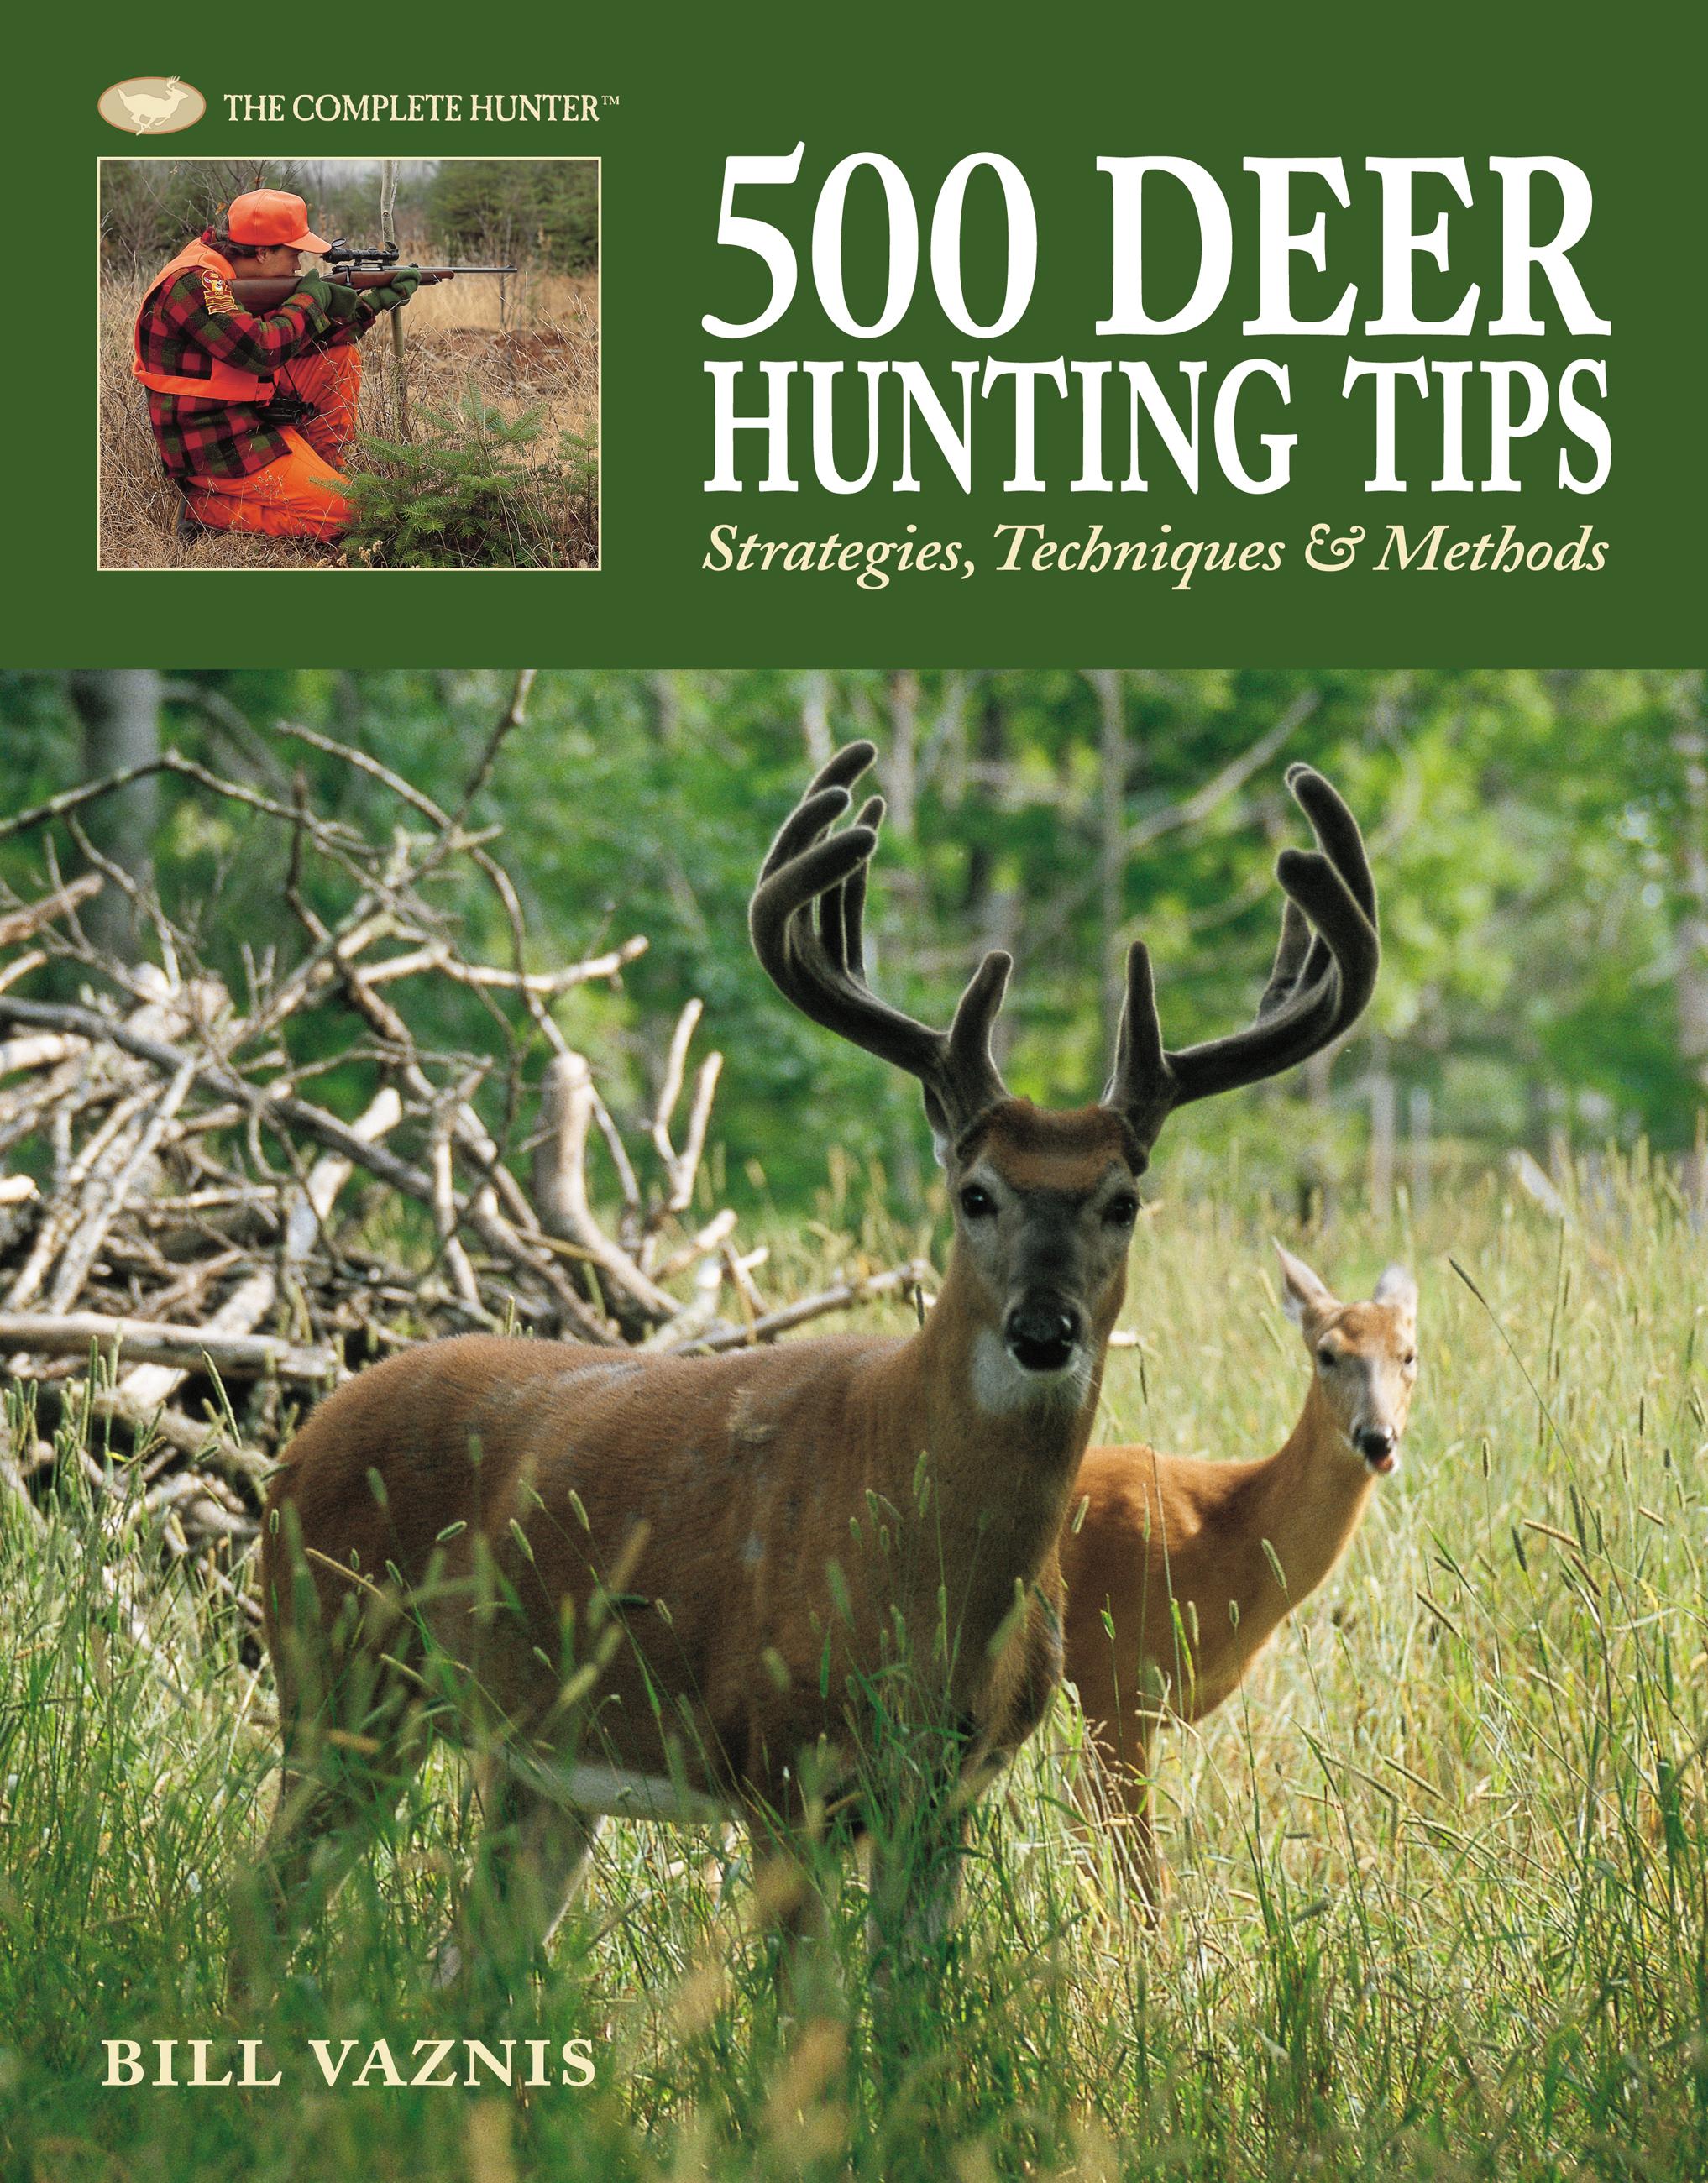 500 Deer Hunting Tips Strategies, Techniques & Methods